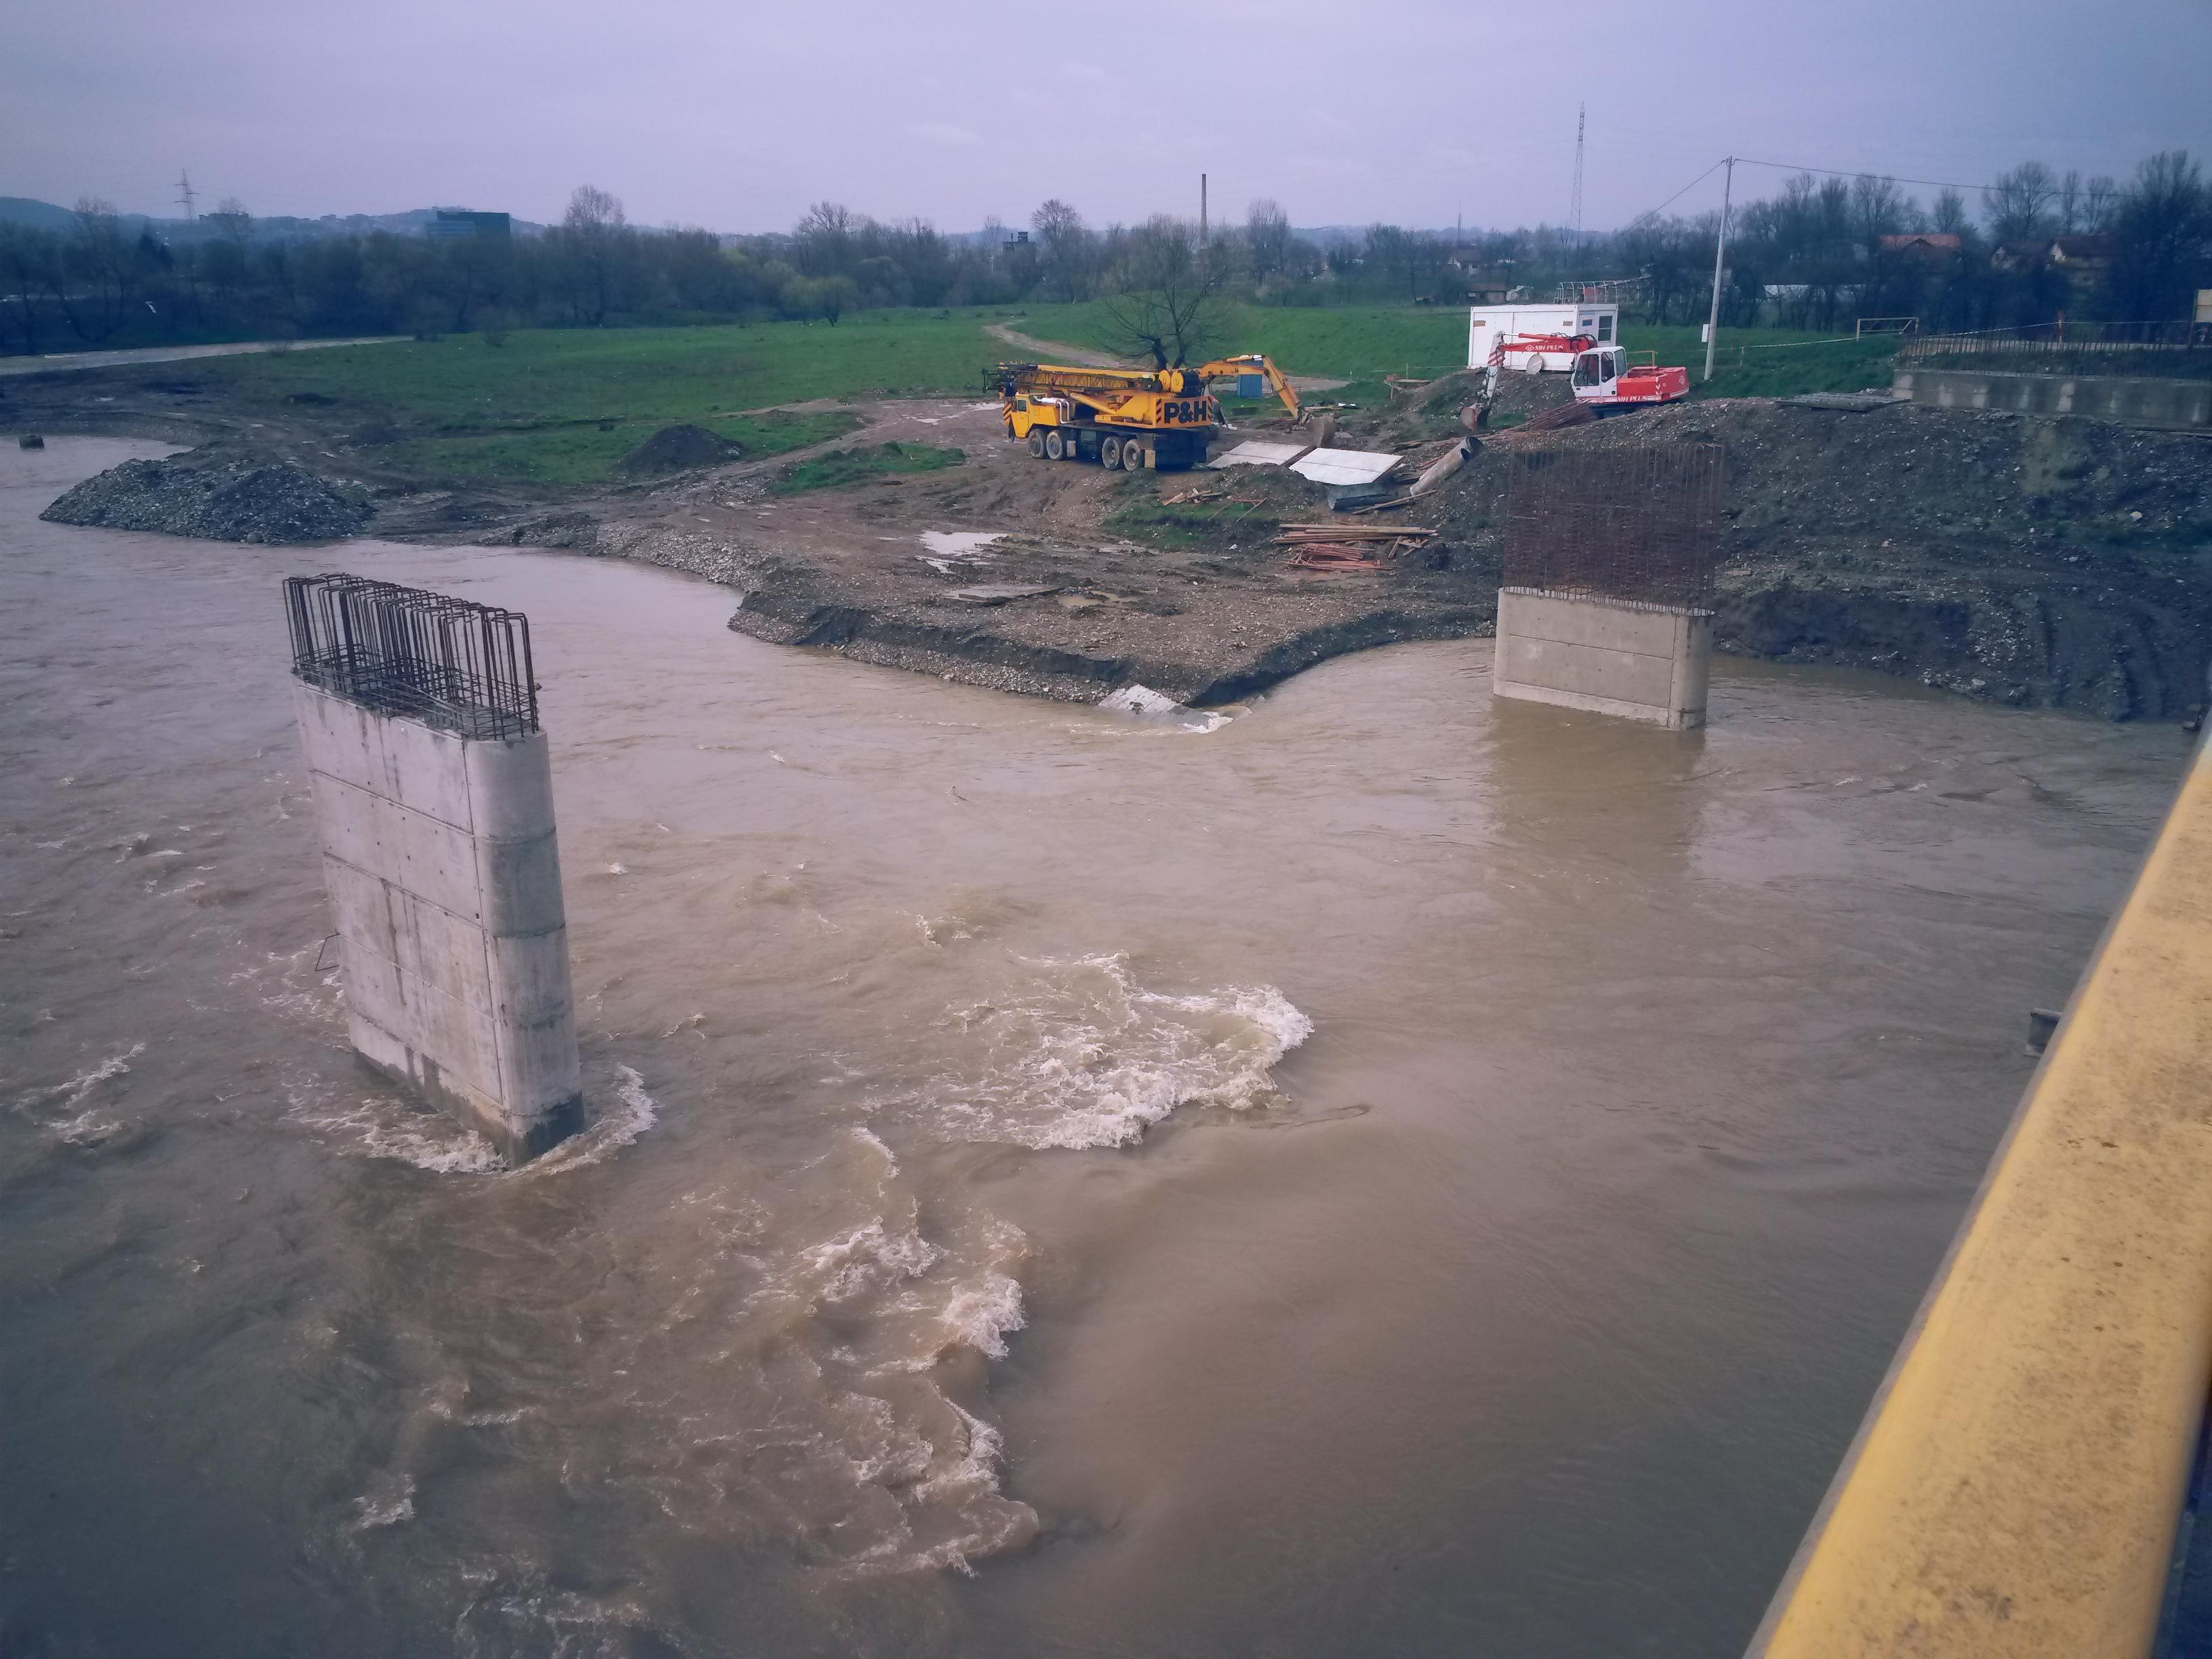 Hej mostovi na Vrbanji: Dokle se stiglo (FOTO)